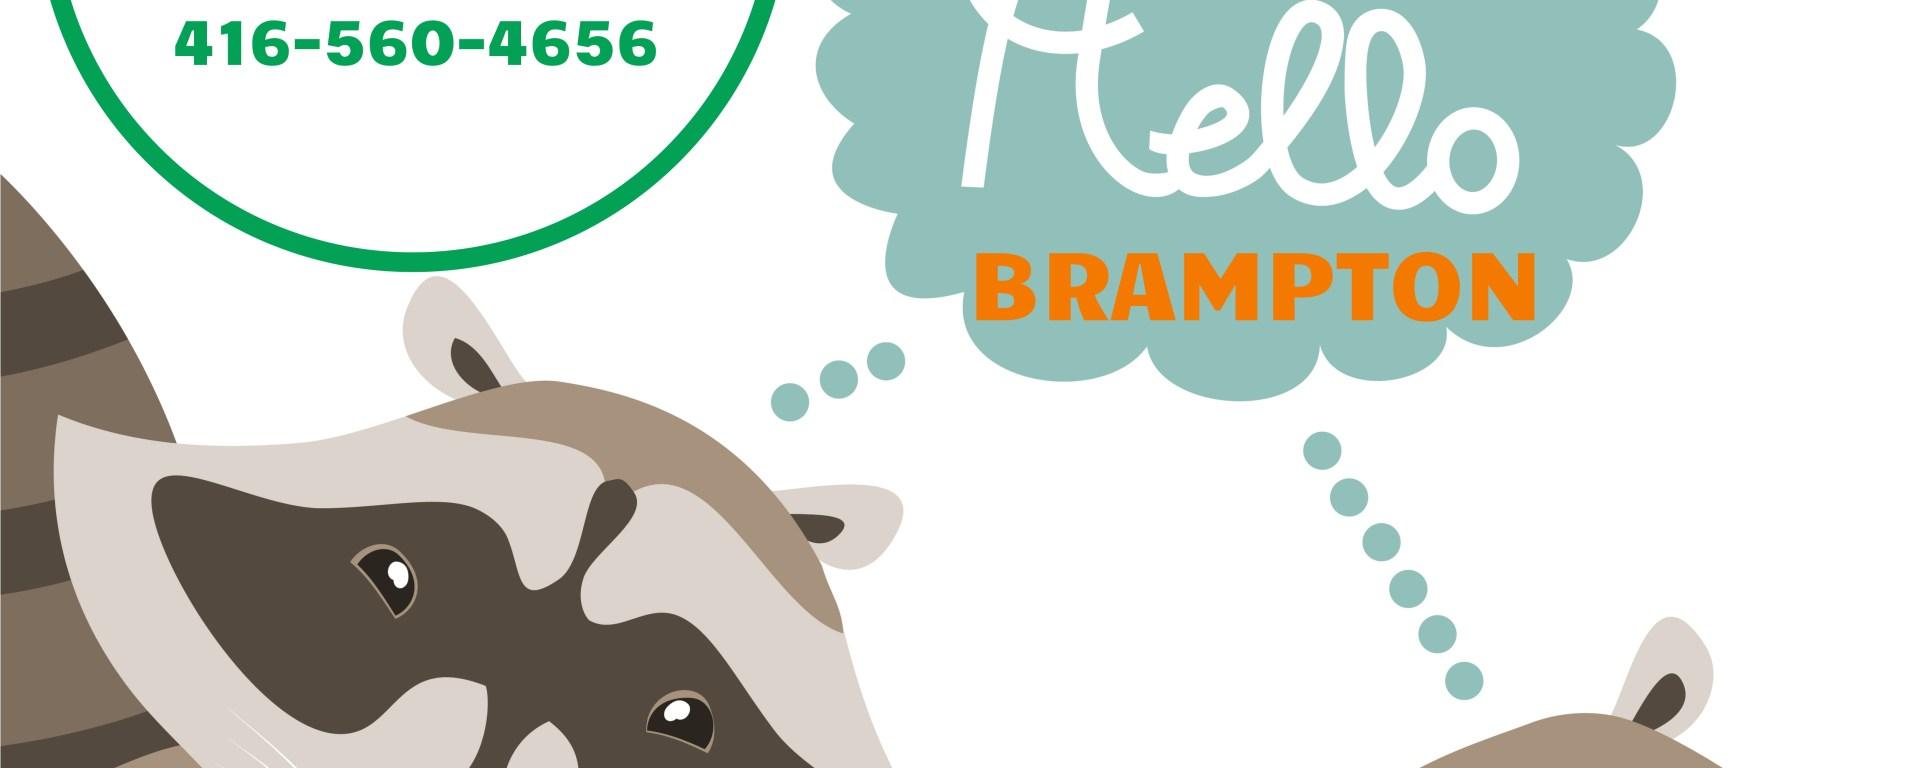 Wildlife Removal in Brampton, Squirrel Removal Brampton, Raccoon Removal Brampton